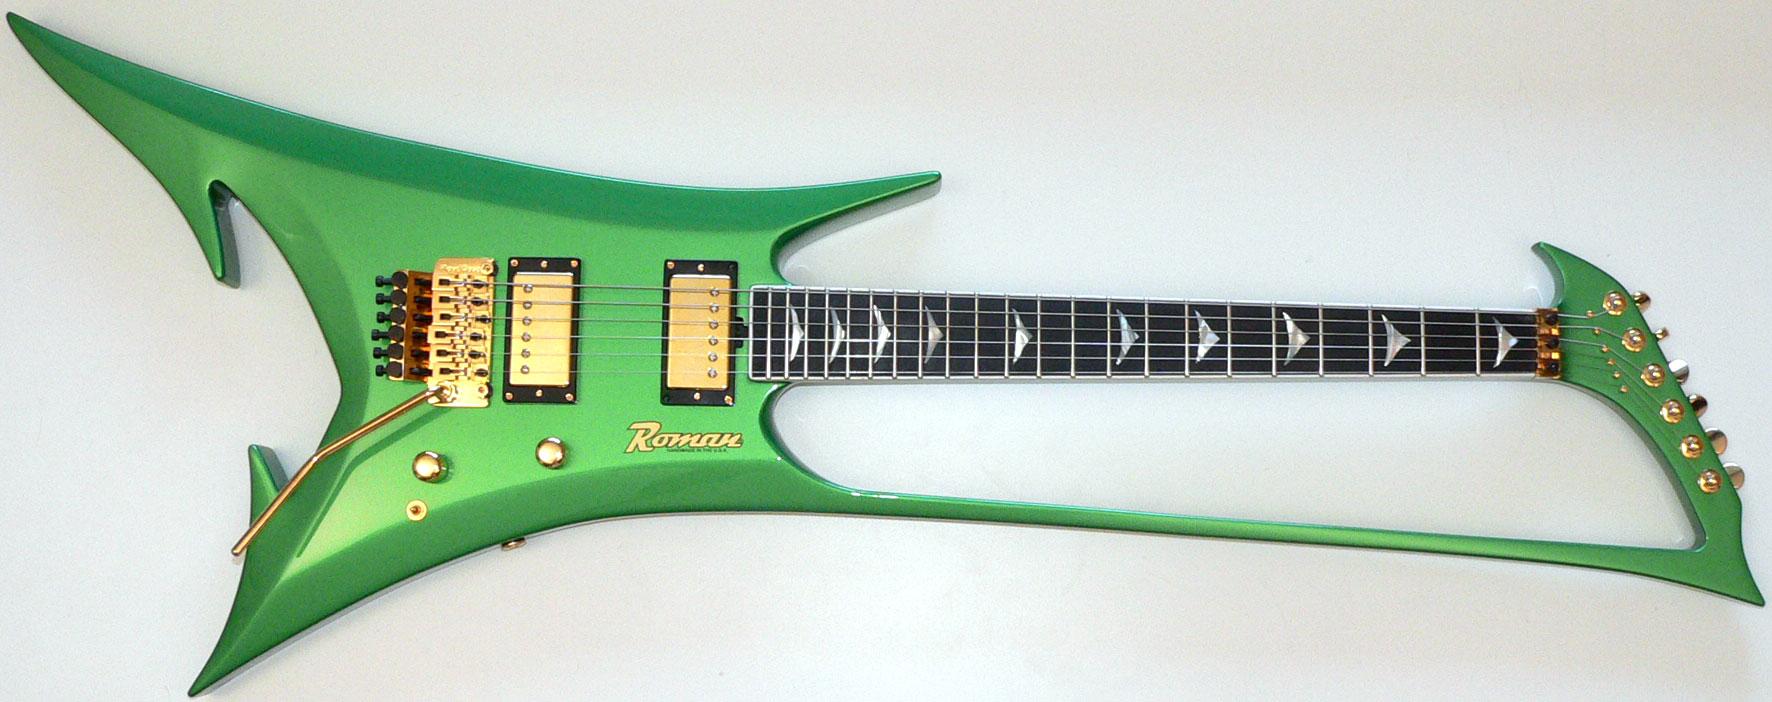 jt pov 11 21 5 cool custom electric guitars shockboxtv. Black Bedroom Furniture Sets. Home Design Ideas